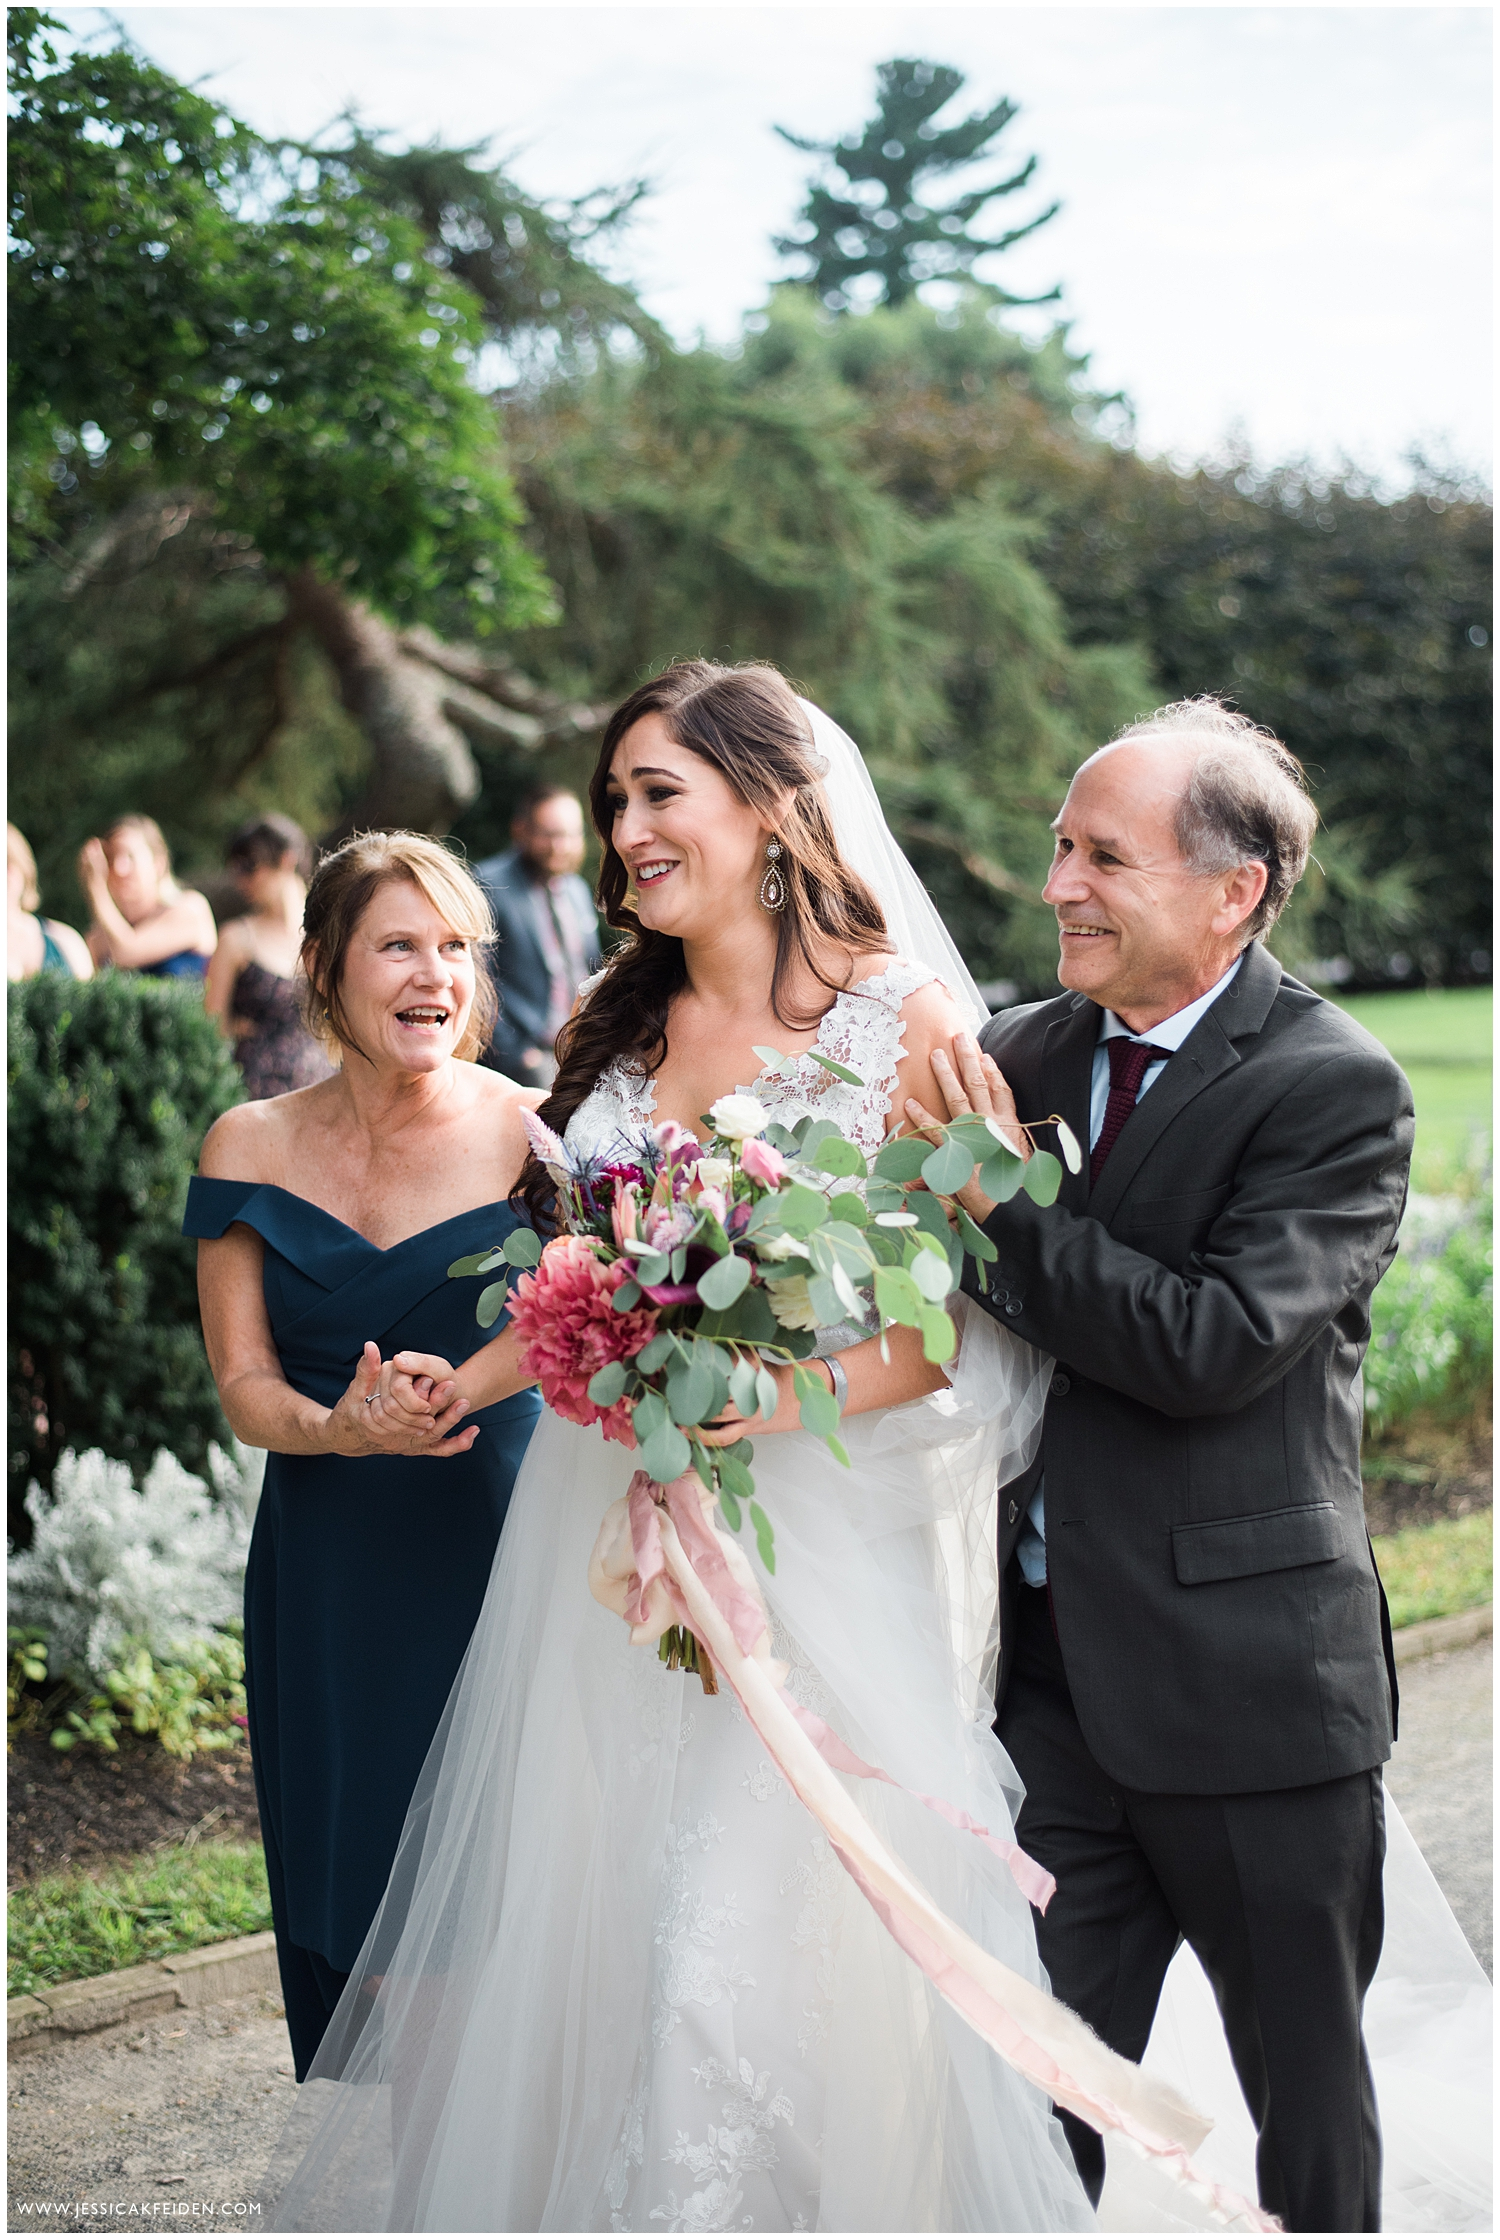 Jessica K Feiden Photography_Gardens at Elm Bank Wedding_0024.jpg